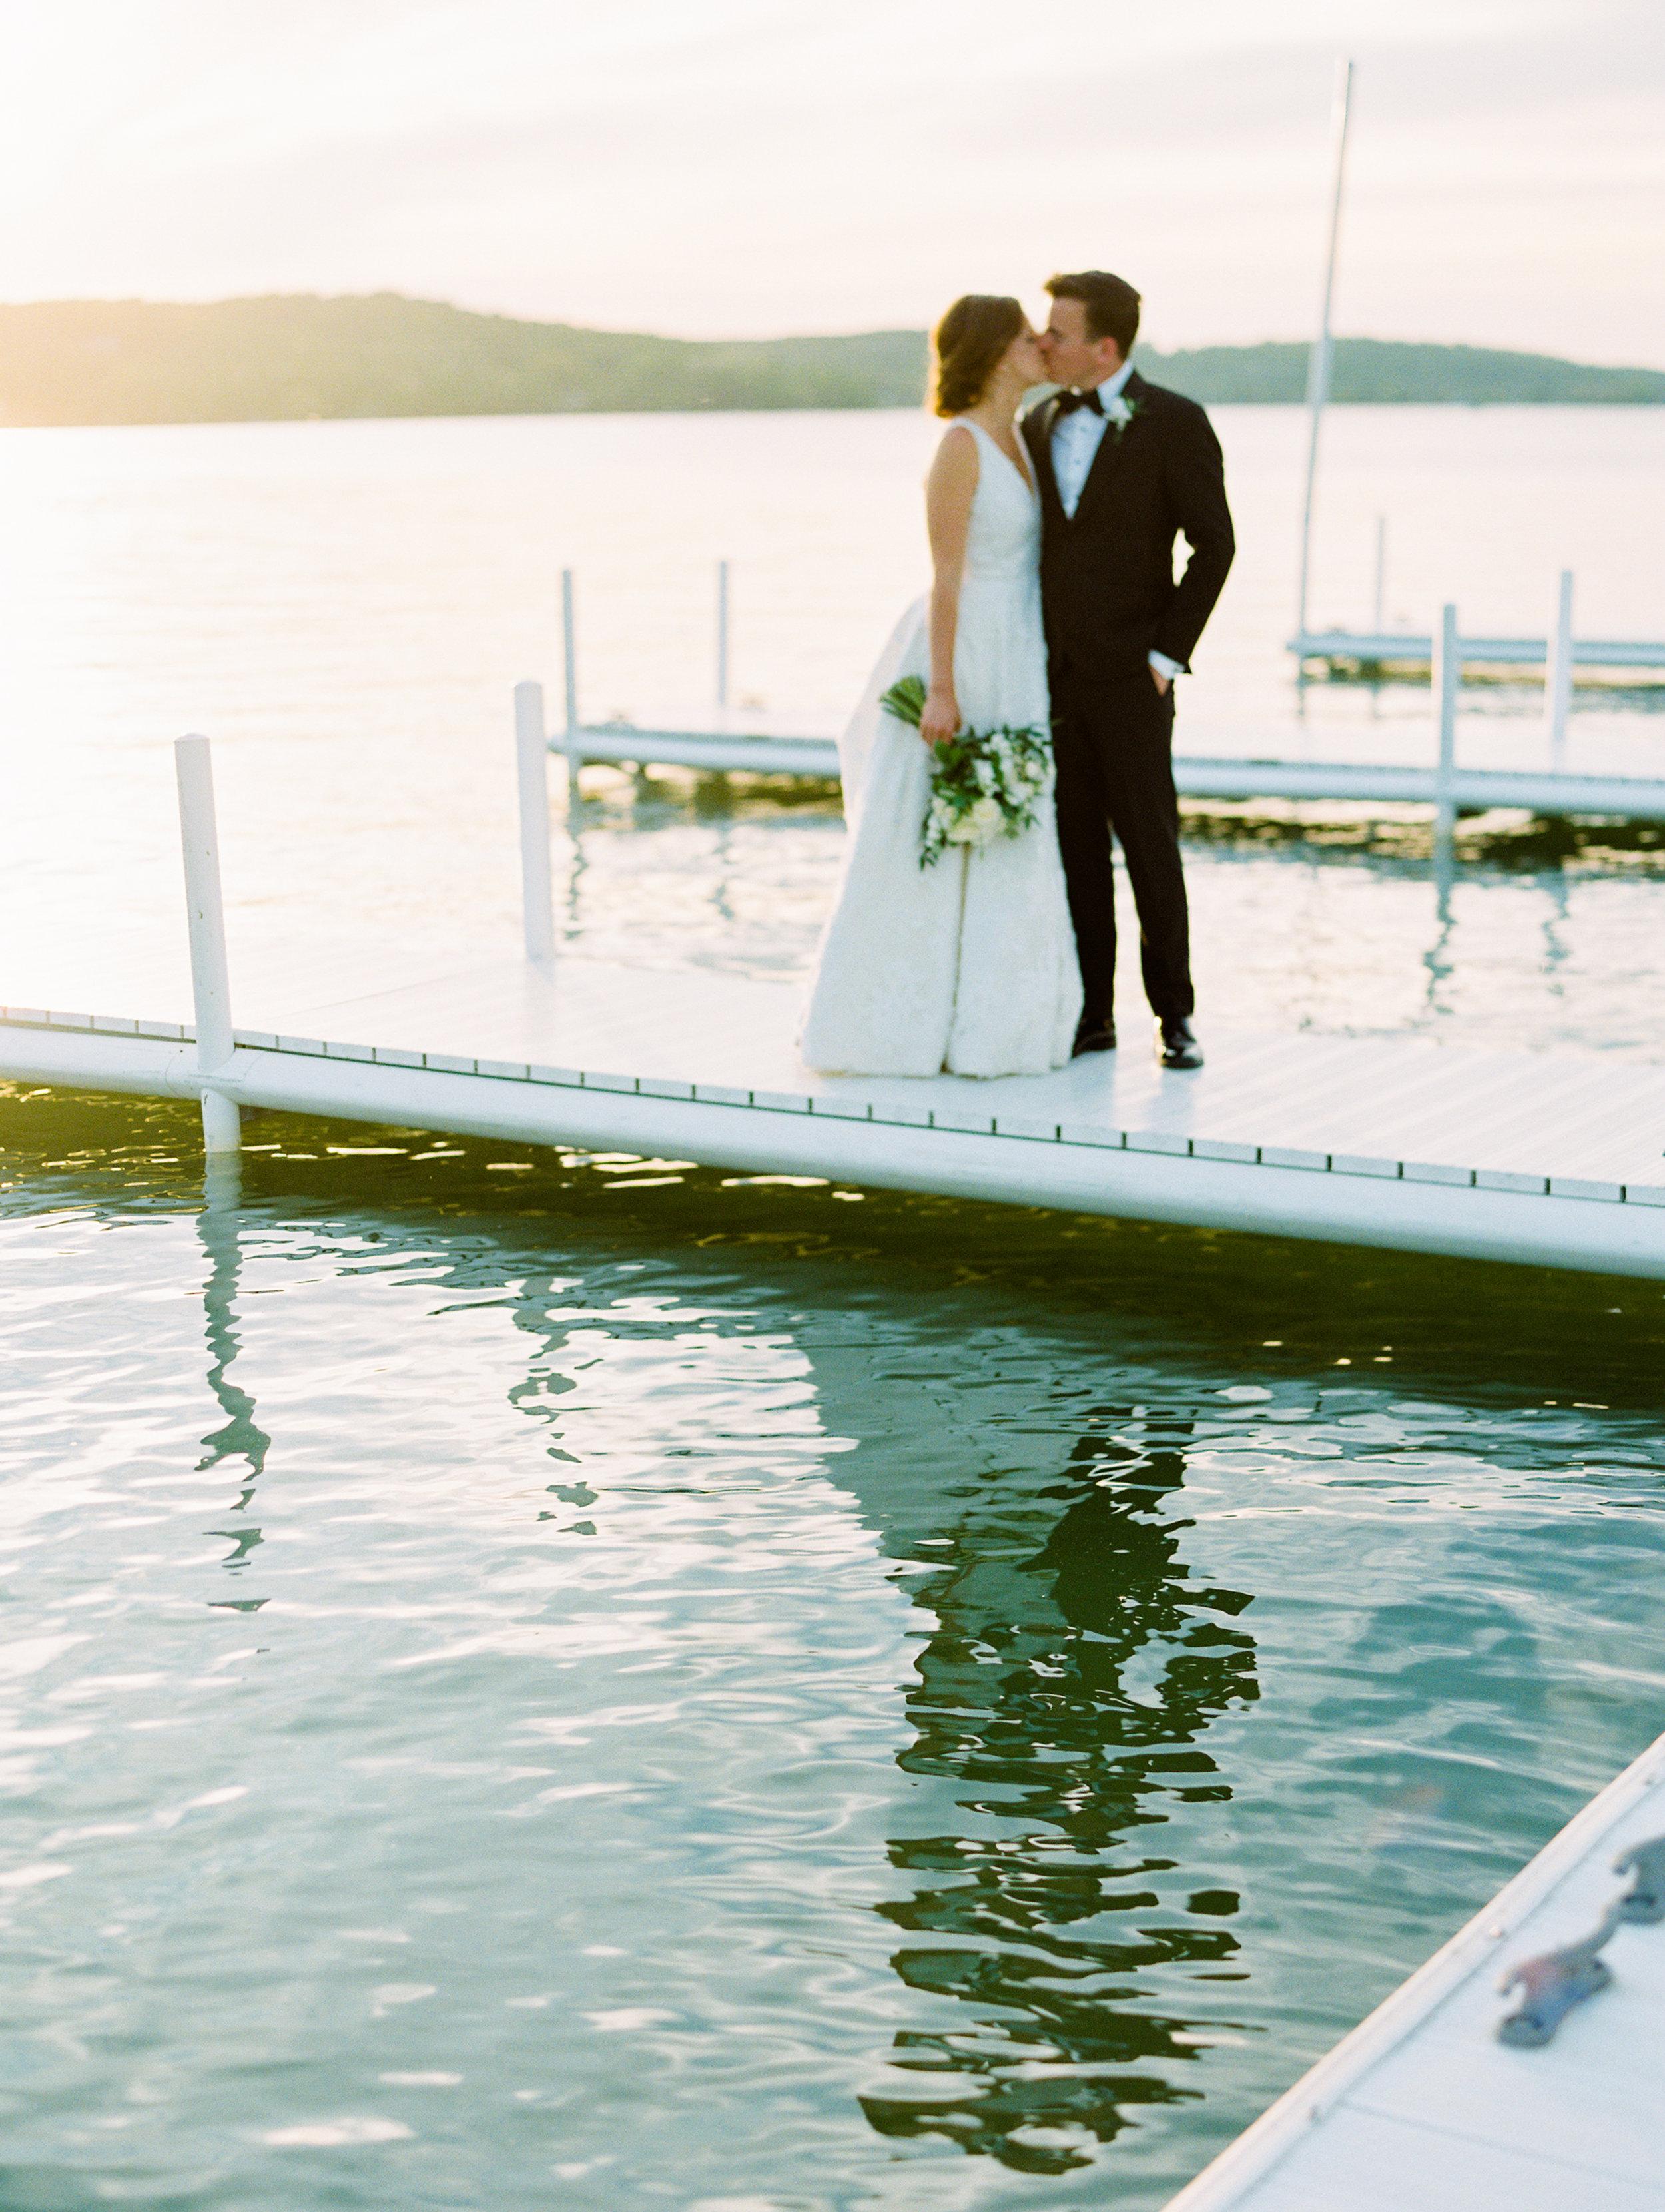 DeGuilio+Wedding+BrideGroomSunsetf-16.jpg